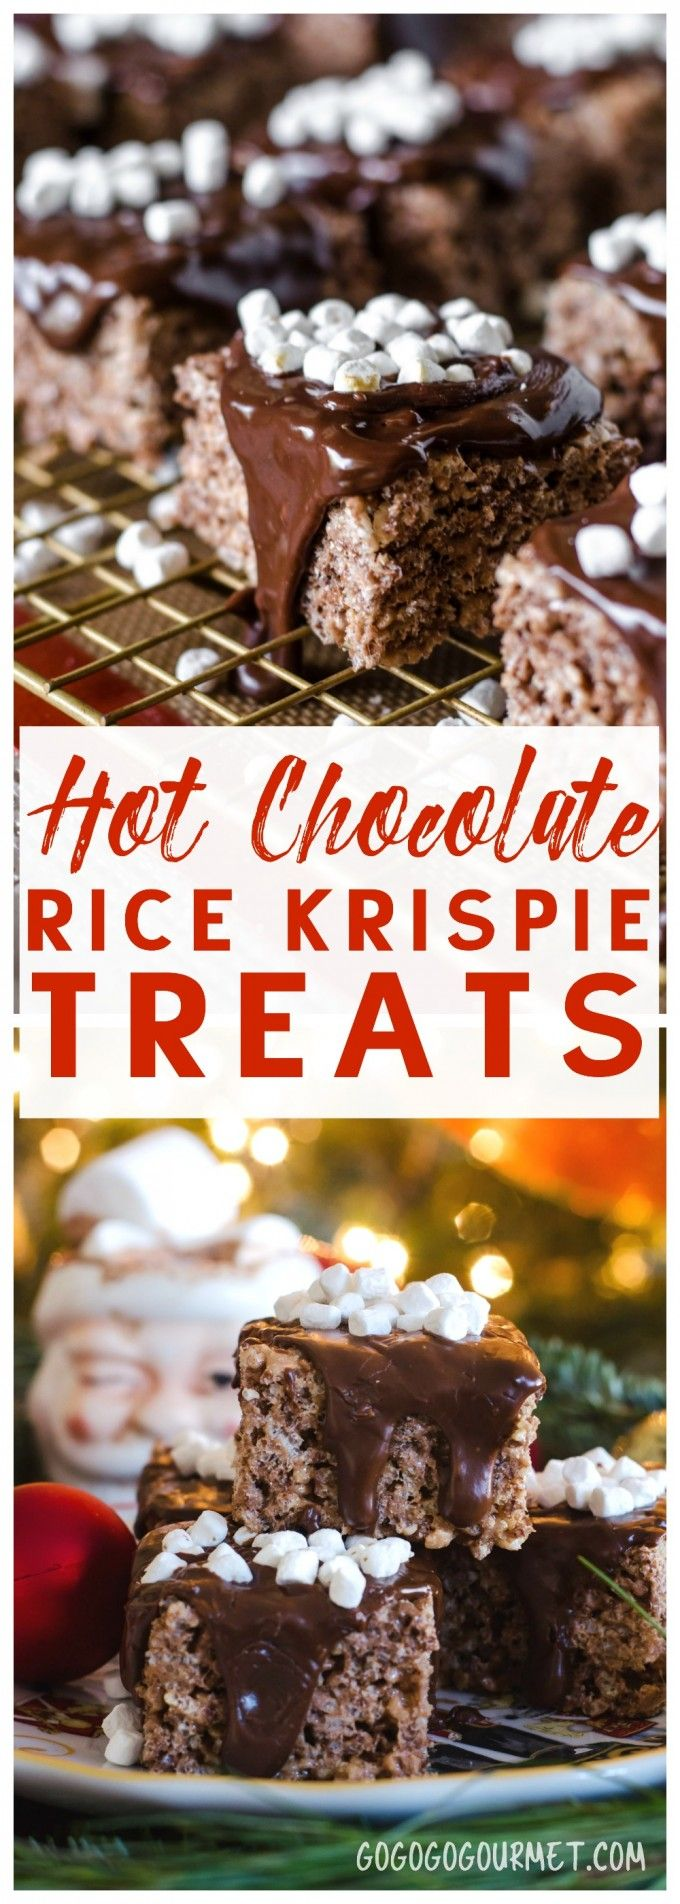 Hot Chocolate Rice Krispies® Treats- a fast and easy holiday no-bake treat!!  via @gogogogourmet #ad HolidayTreatMaking